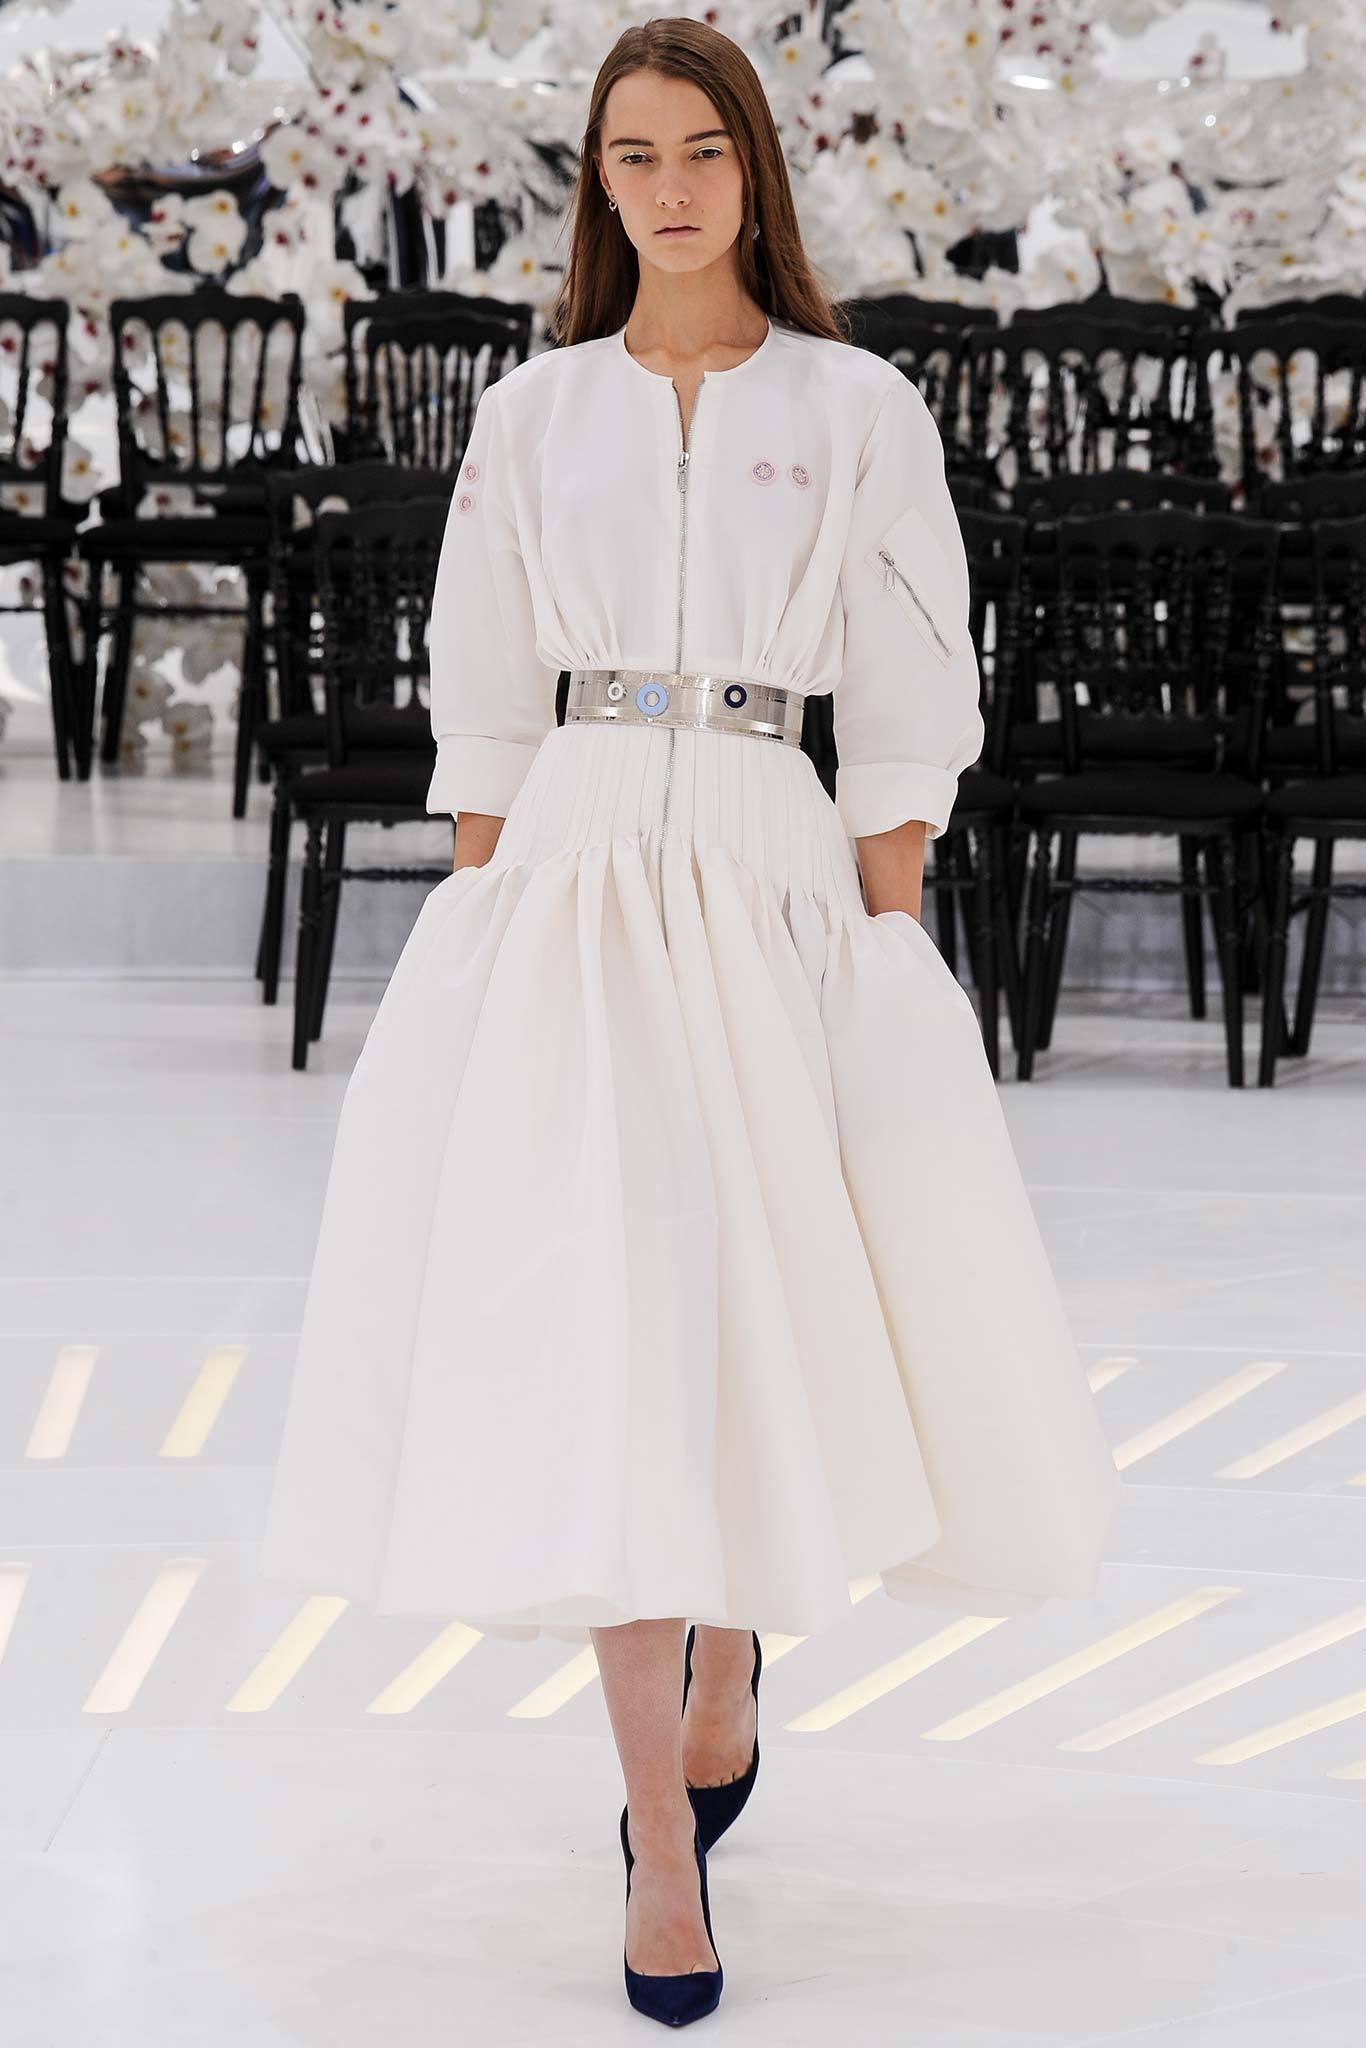 Dior Haute Couture Fall Winter 2014 15 Evelina Khromtchenko